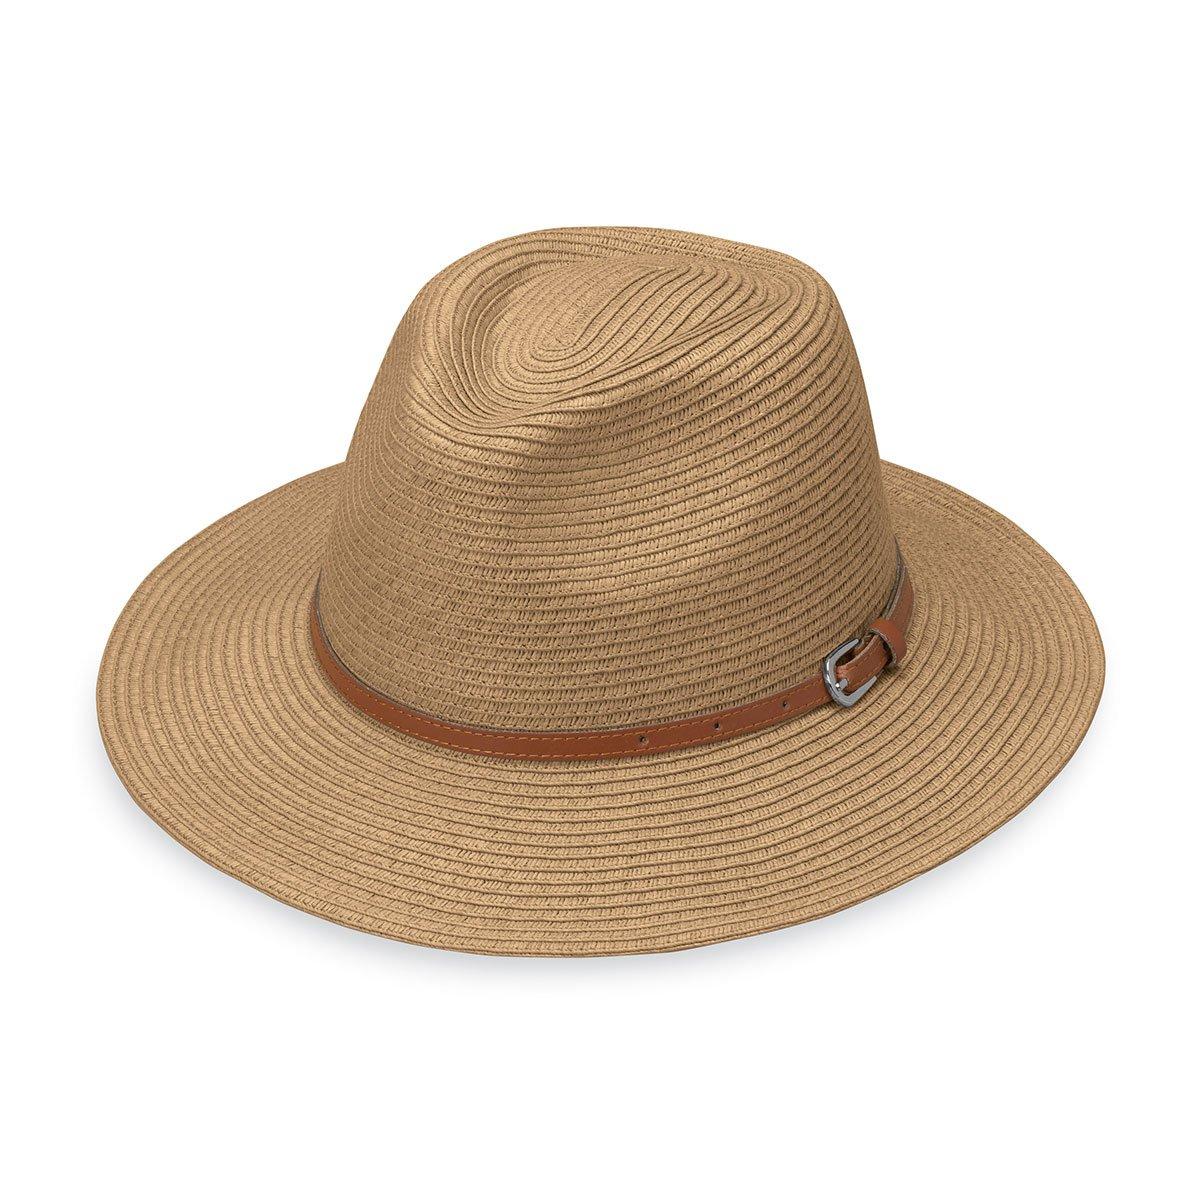 Wallaroo Women's Naples Sun Hat - Colorful Paper Braid Fedora - UPF50+, Camel